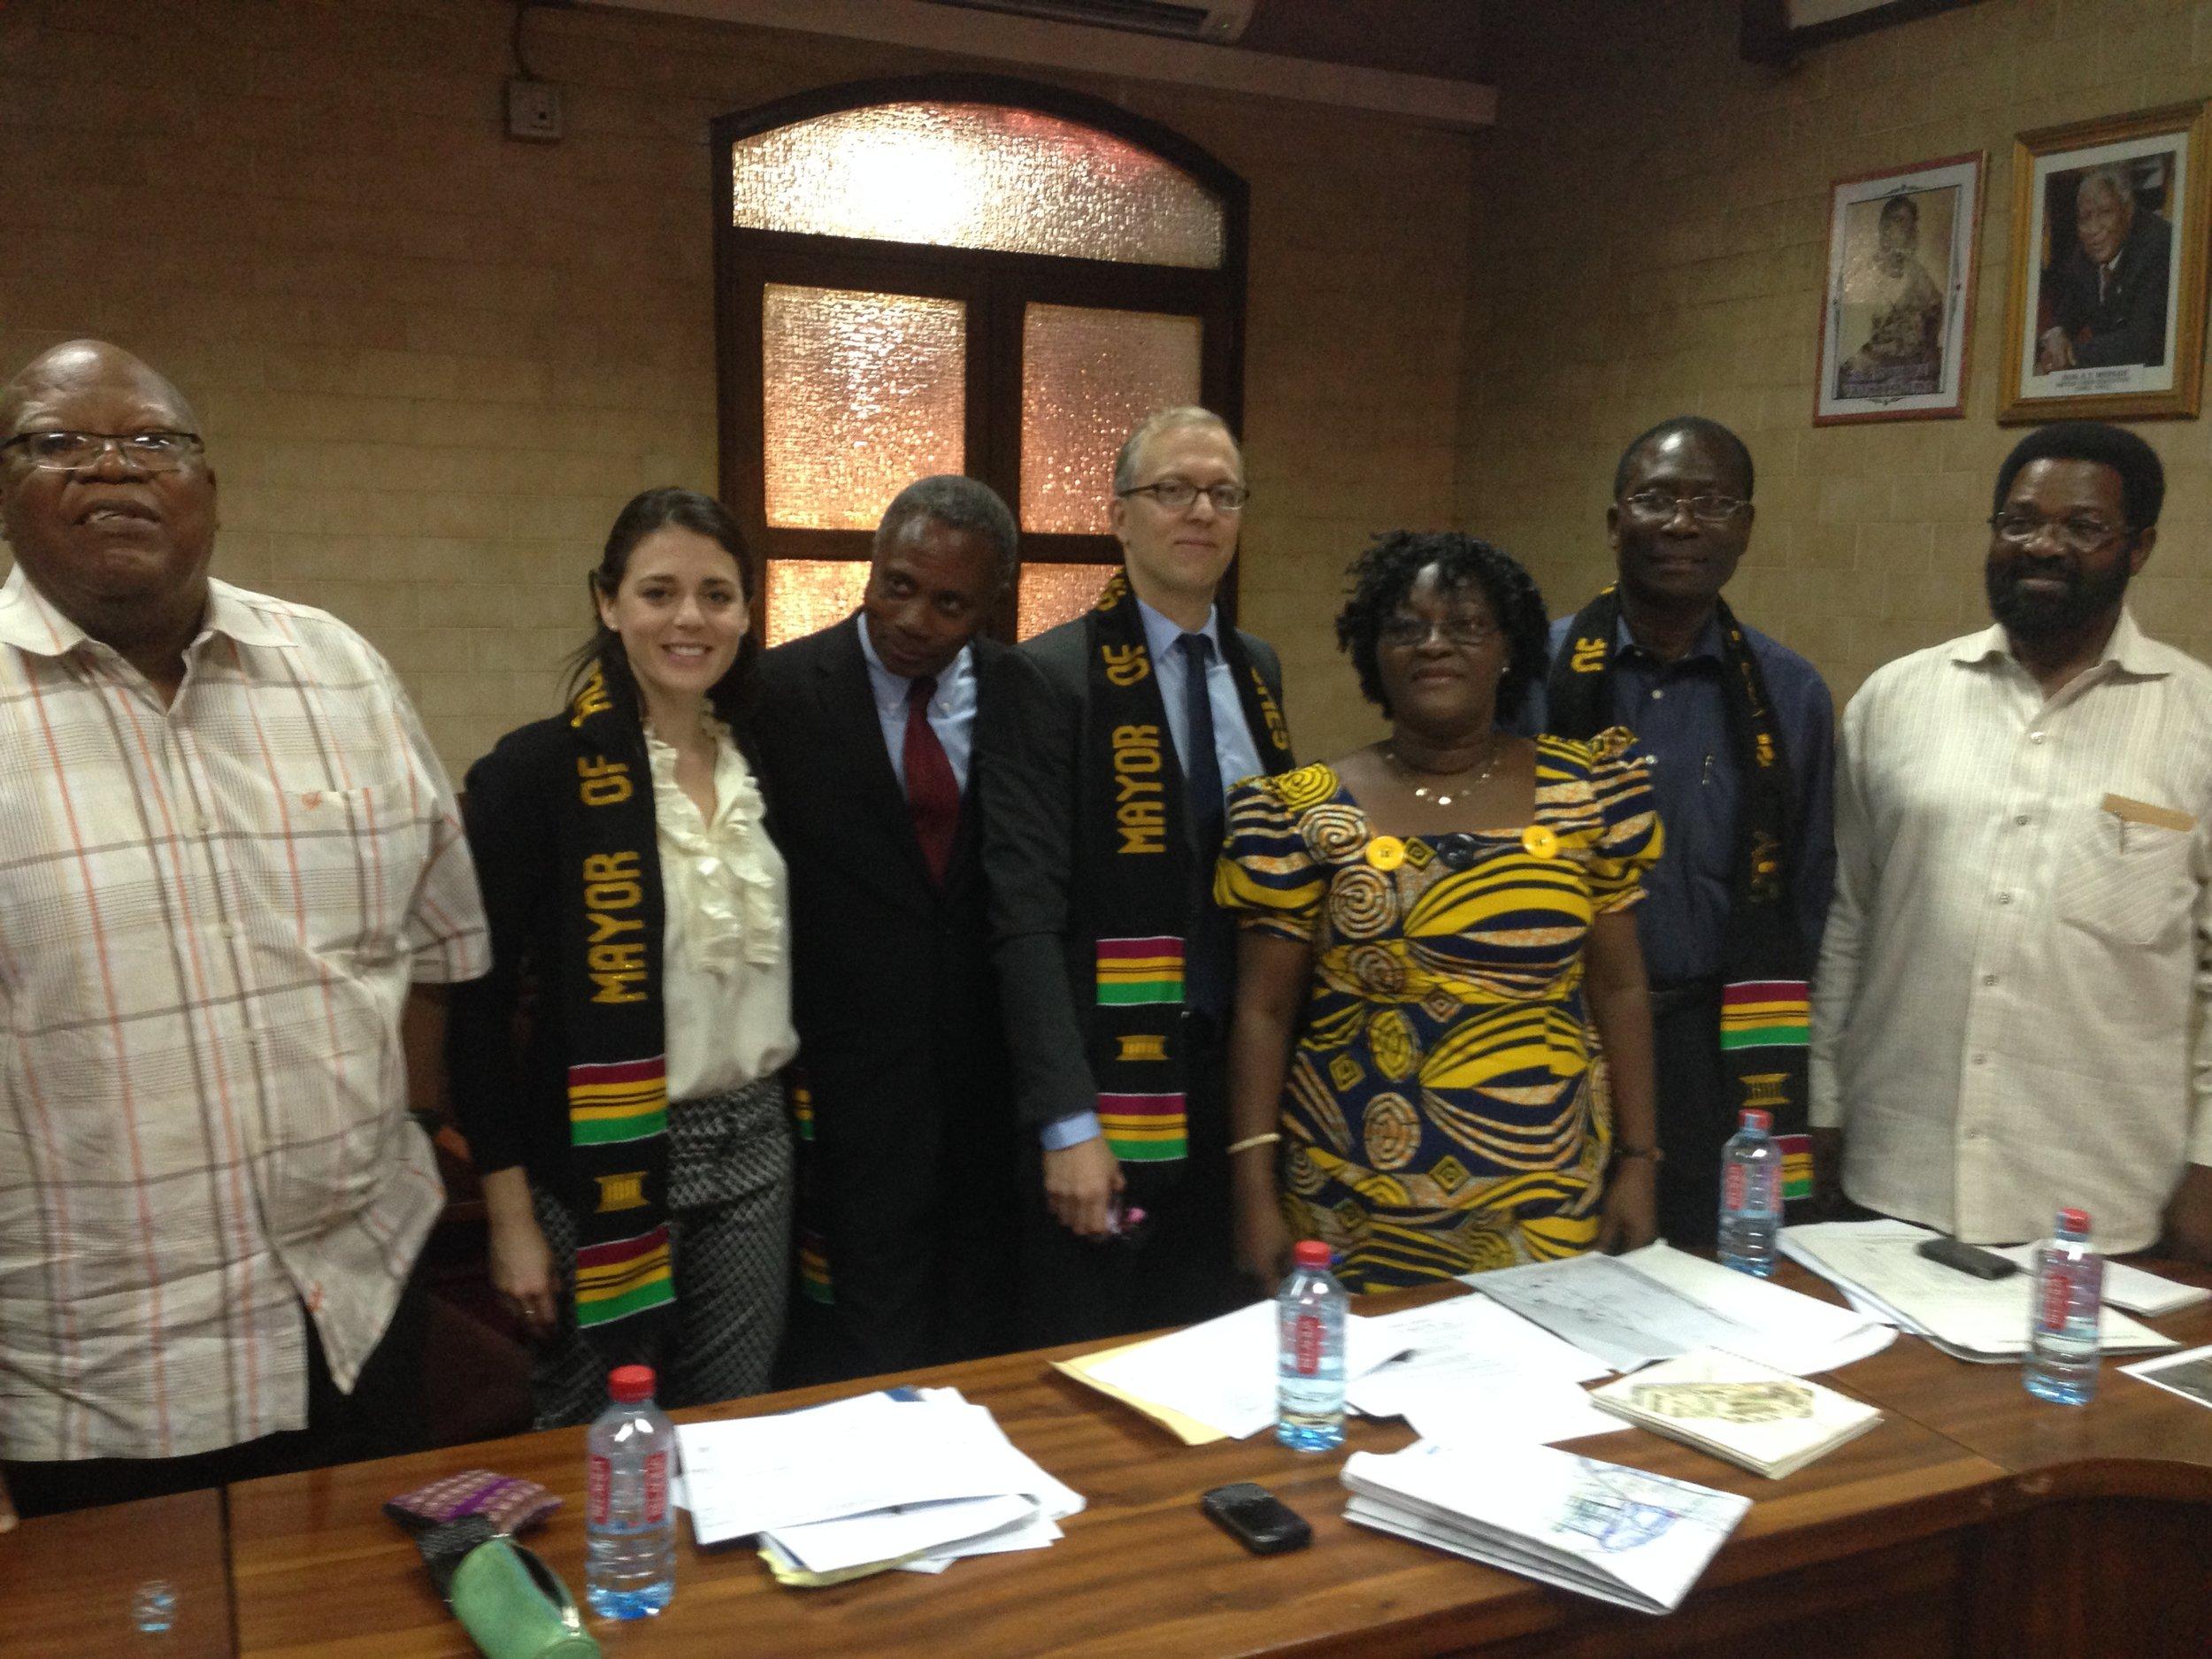 Accra Dec 2013_095_AMA Mtg. L-R_Frm Mayor Amarteifio. J Pehr. Japhet Aryiku. B Fisher. Dir of Budget Lydia Sackey. Consultant Wisdom. Hon. Mayor Vanderpuije.JPG